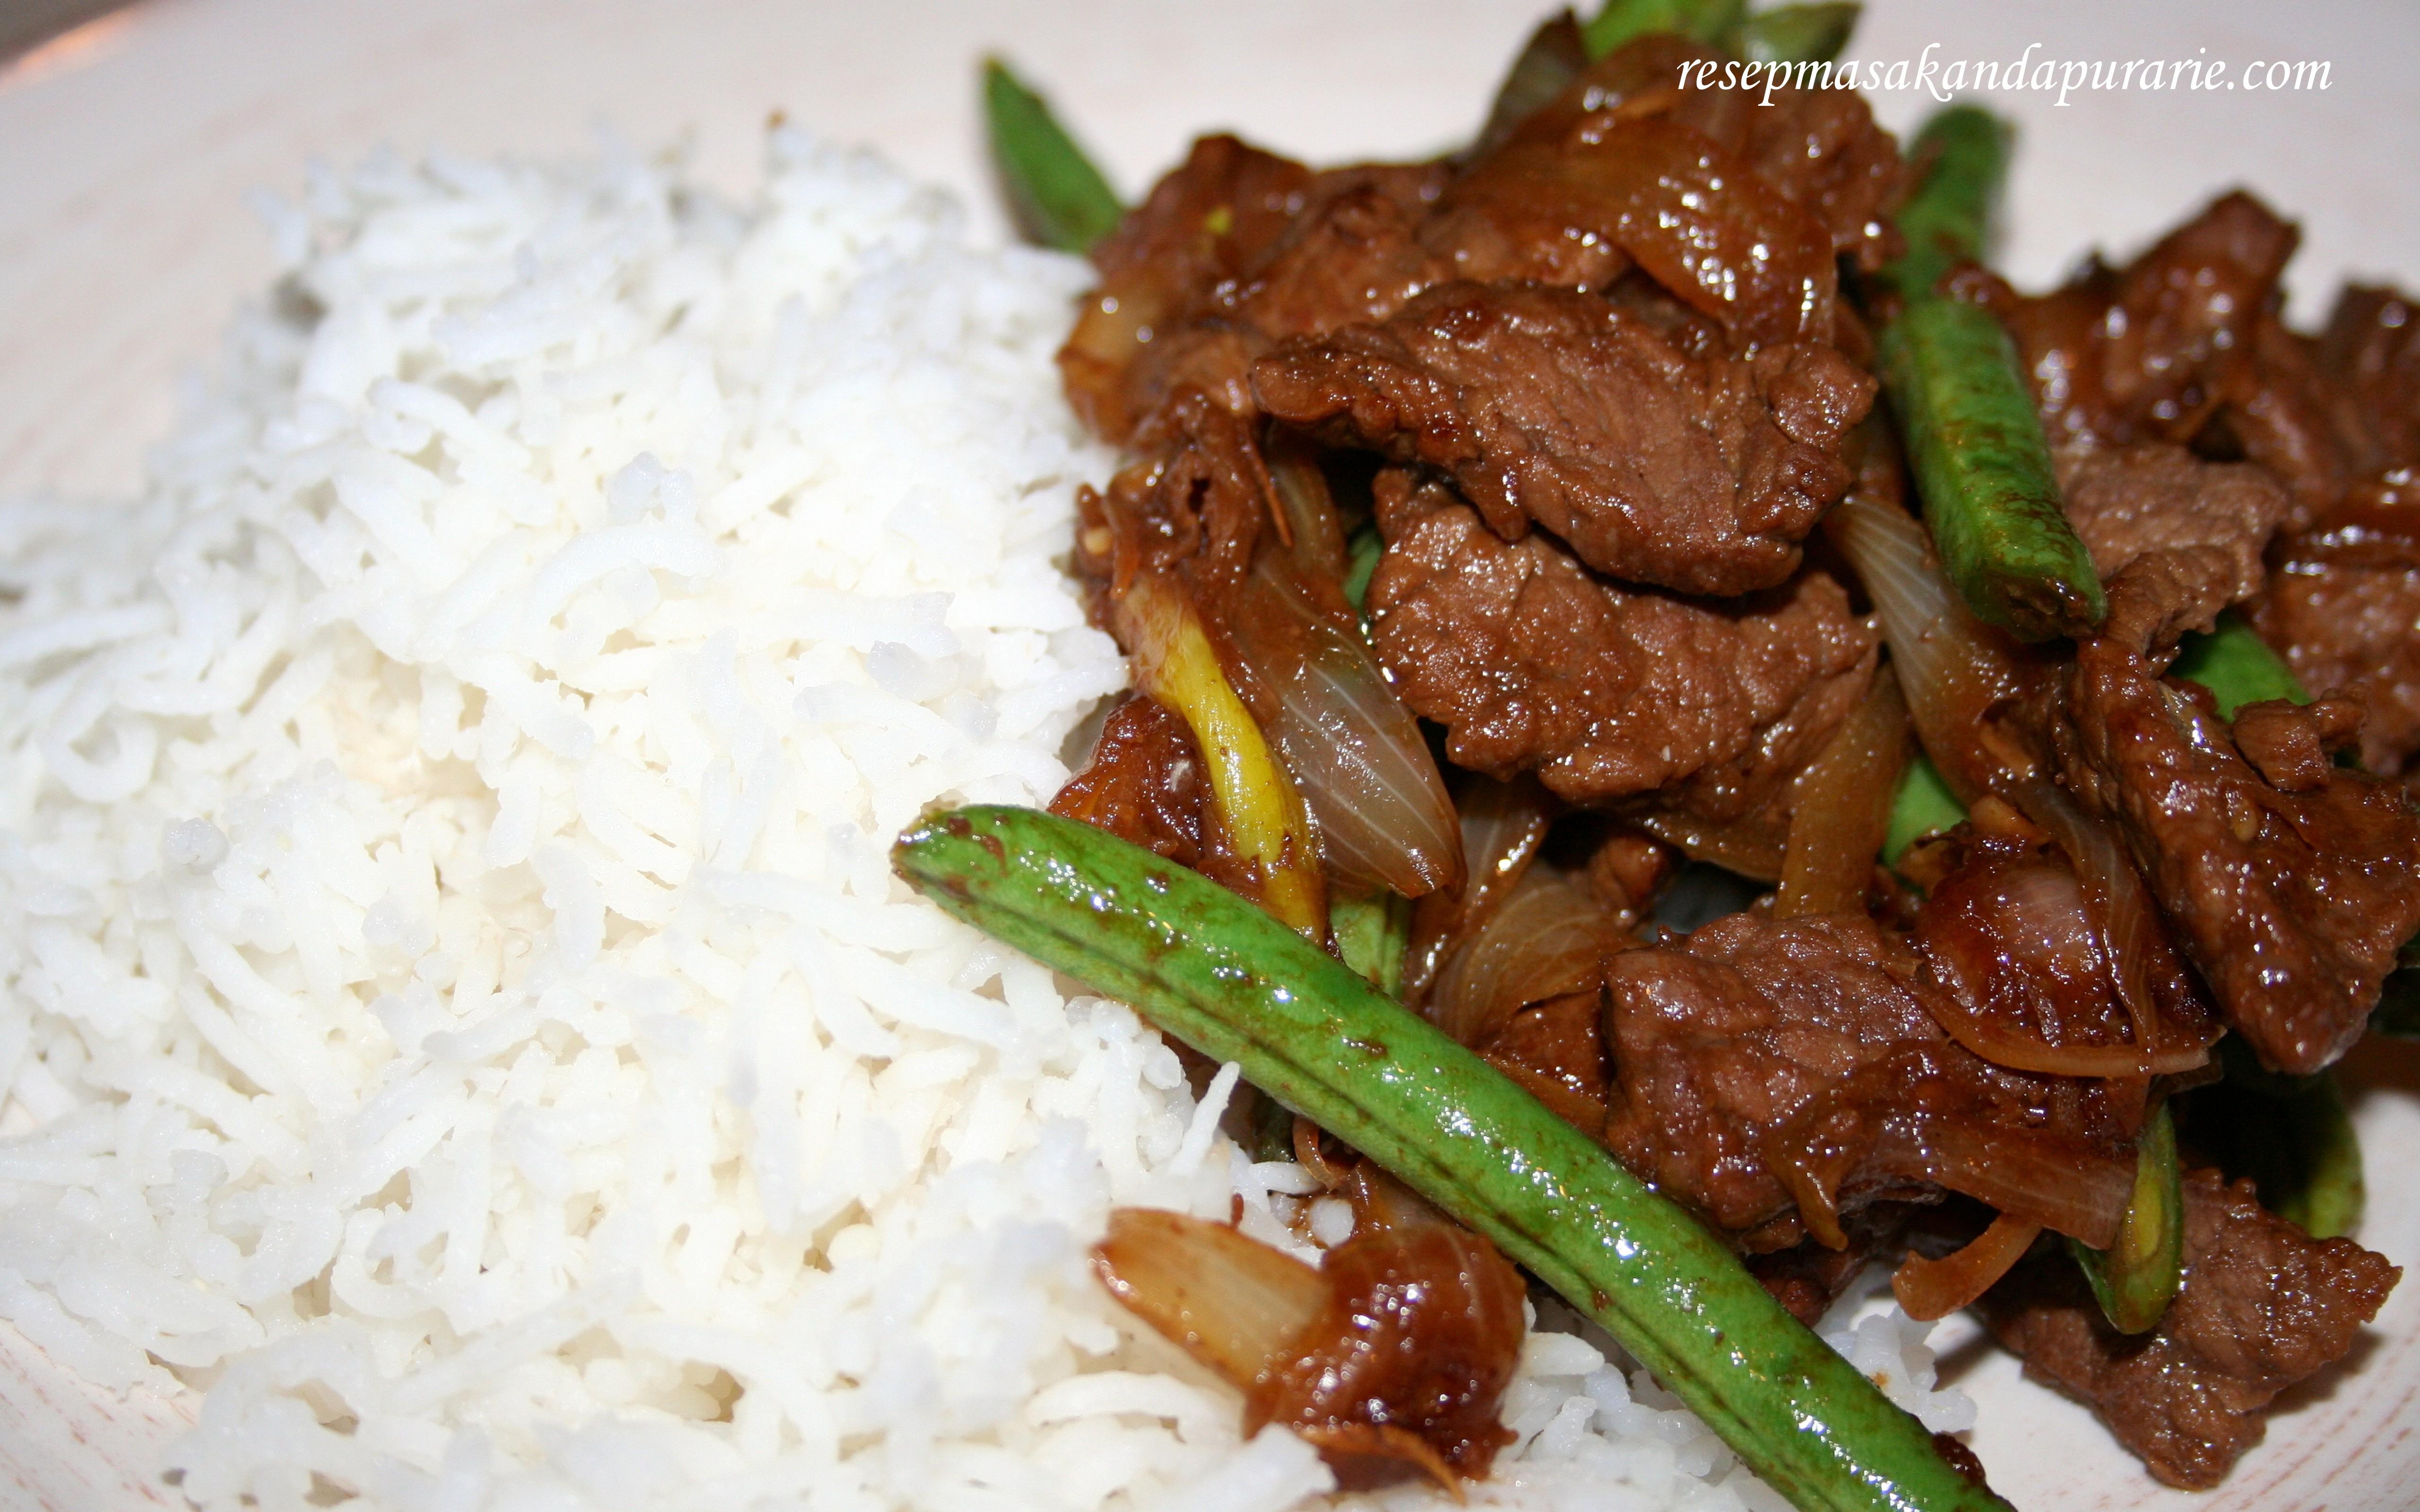 Resep Cara Membuat Daging Sapi Bumbu Serai Resep Masakan